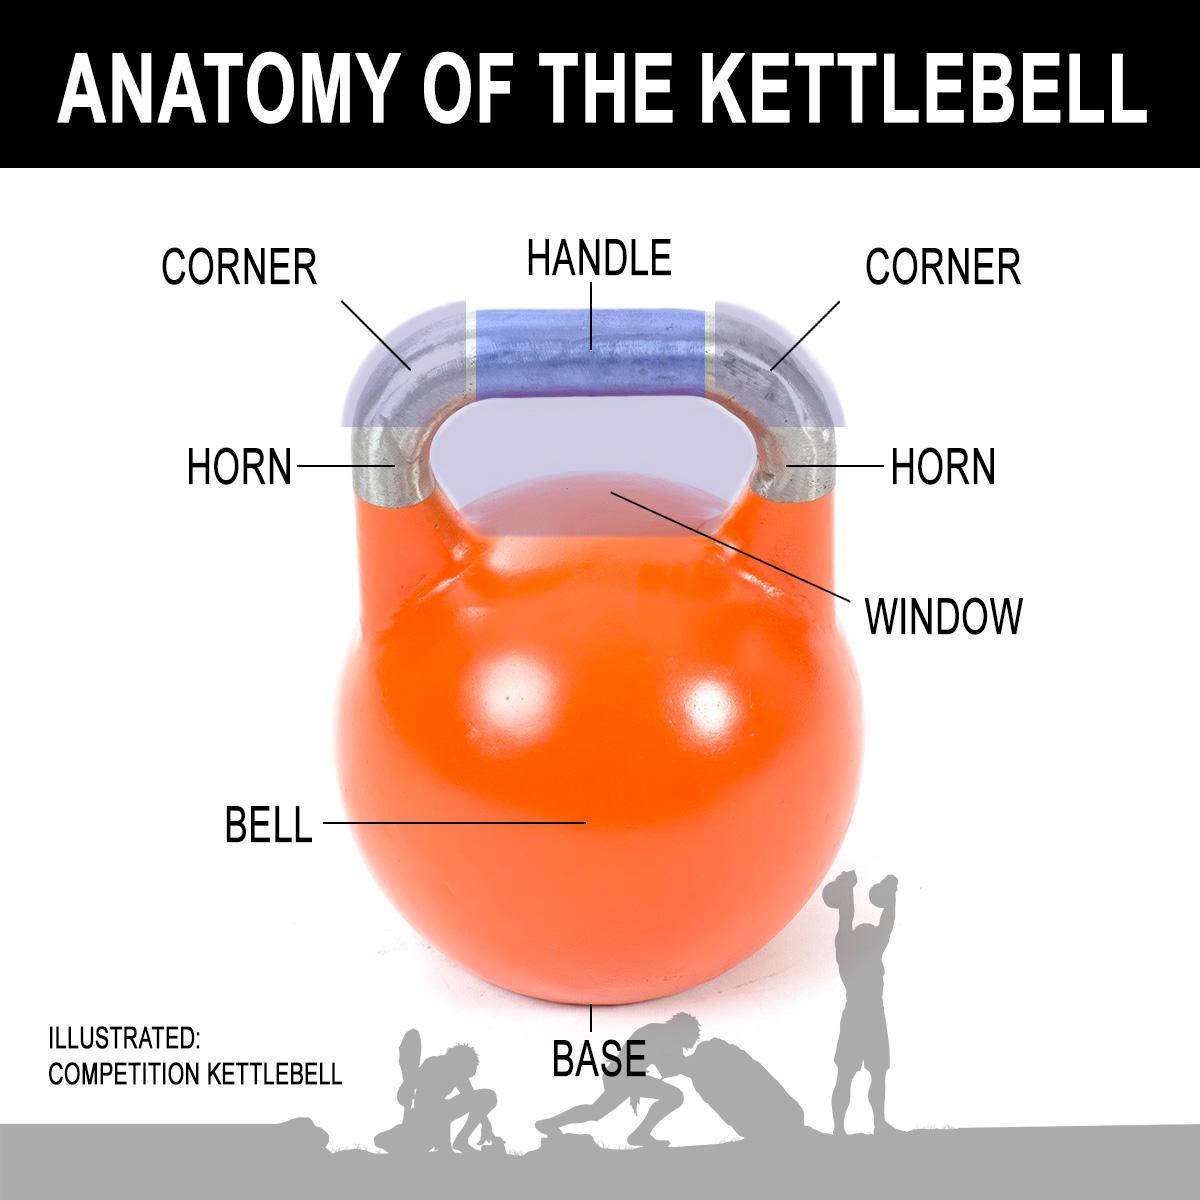 File:Anatomy of the Kettlebell.jpg - Wikipedia